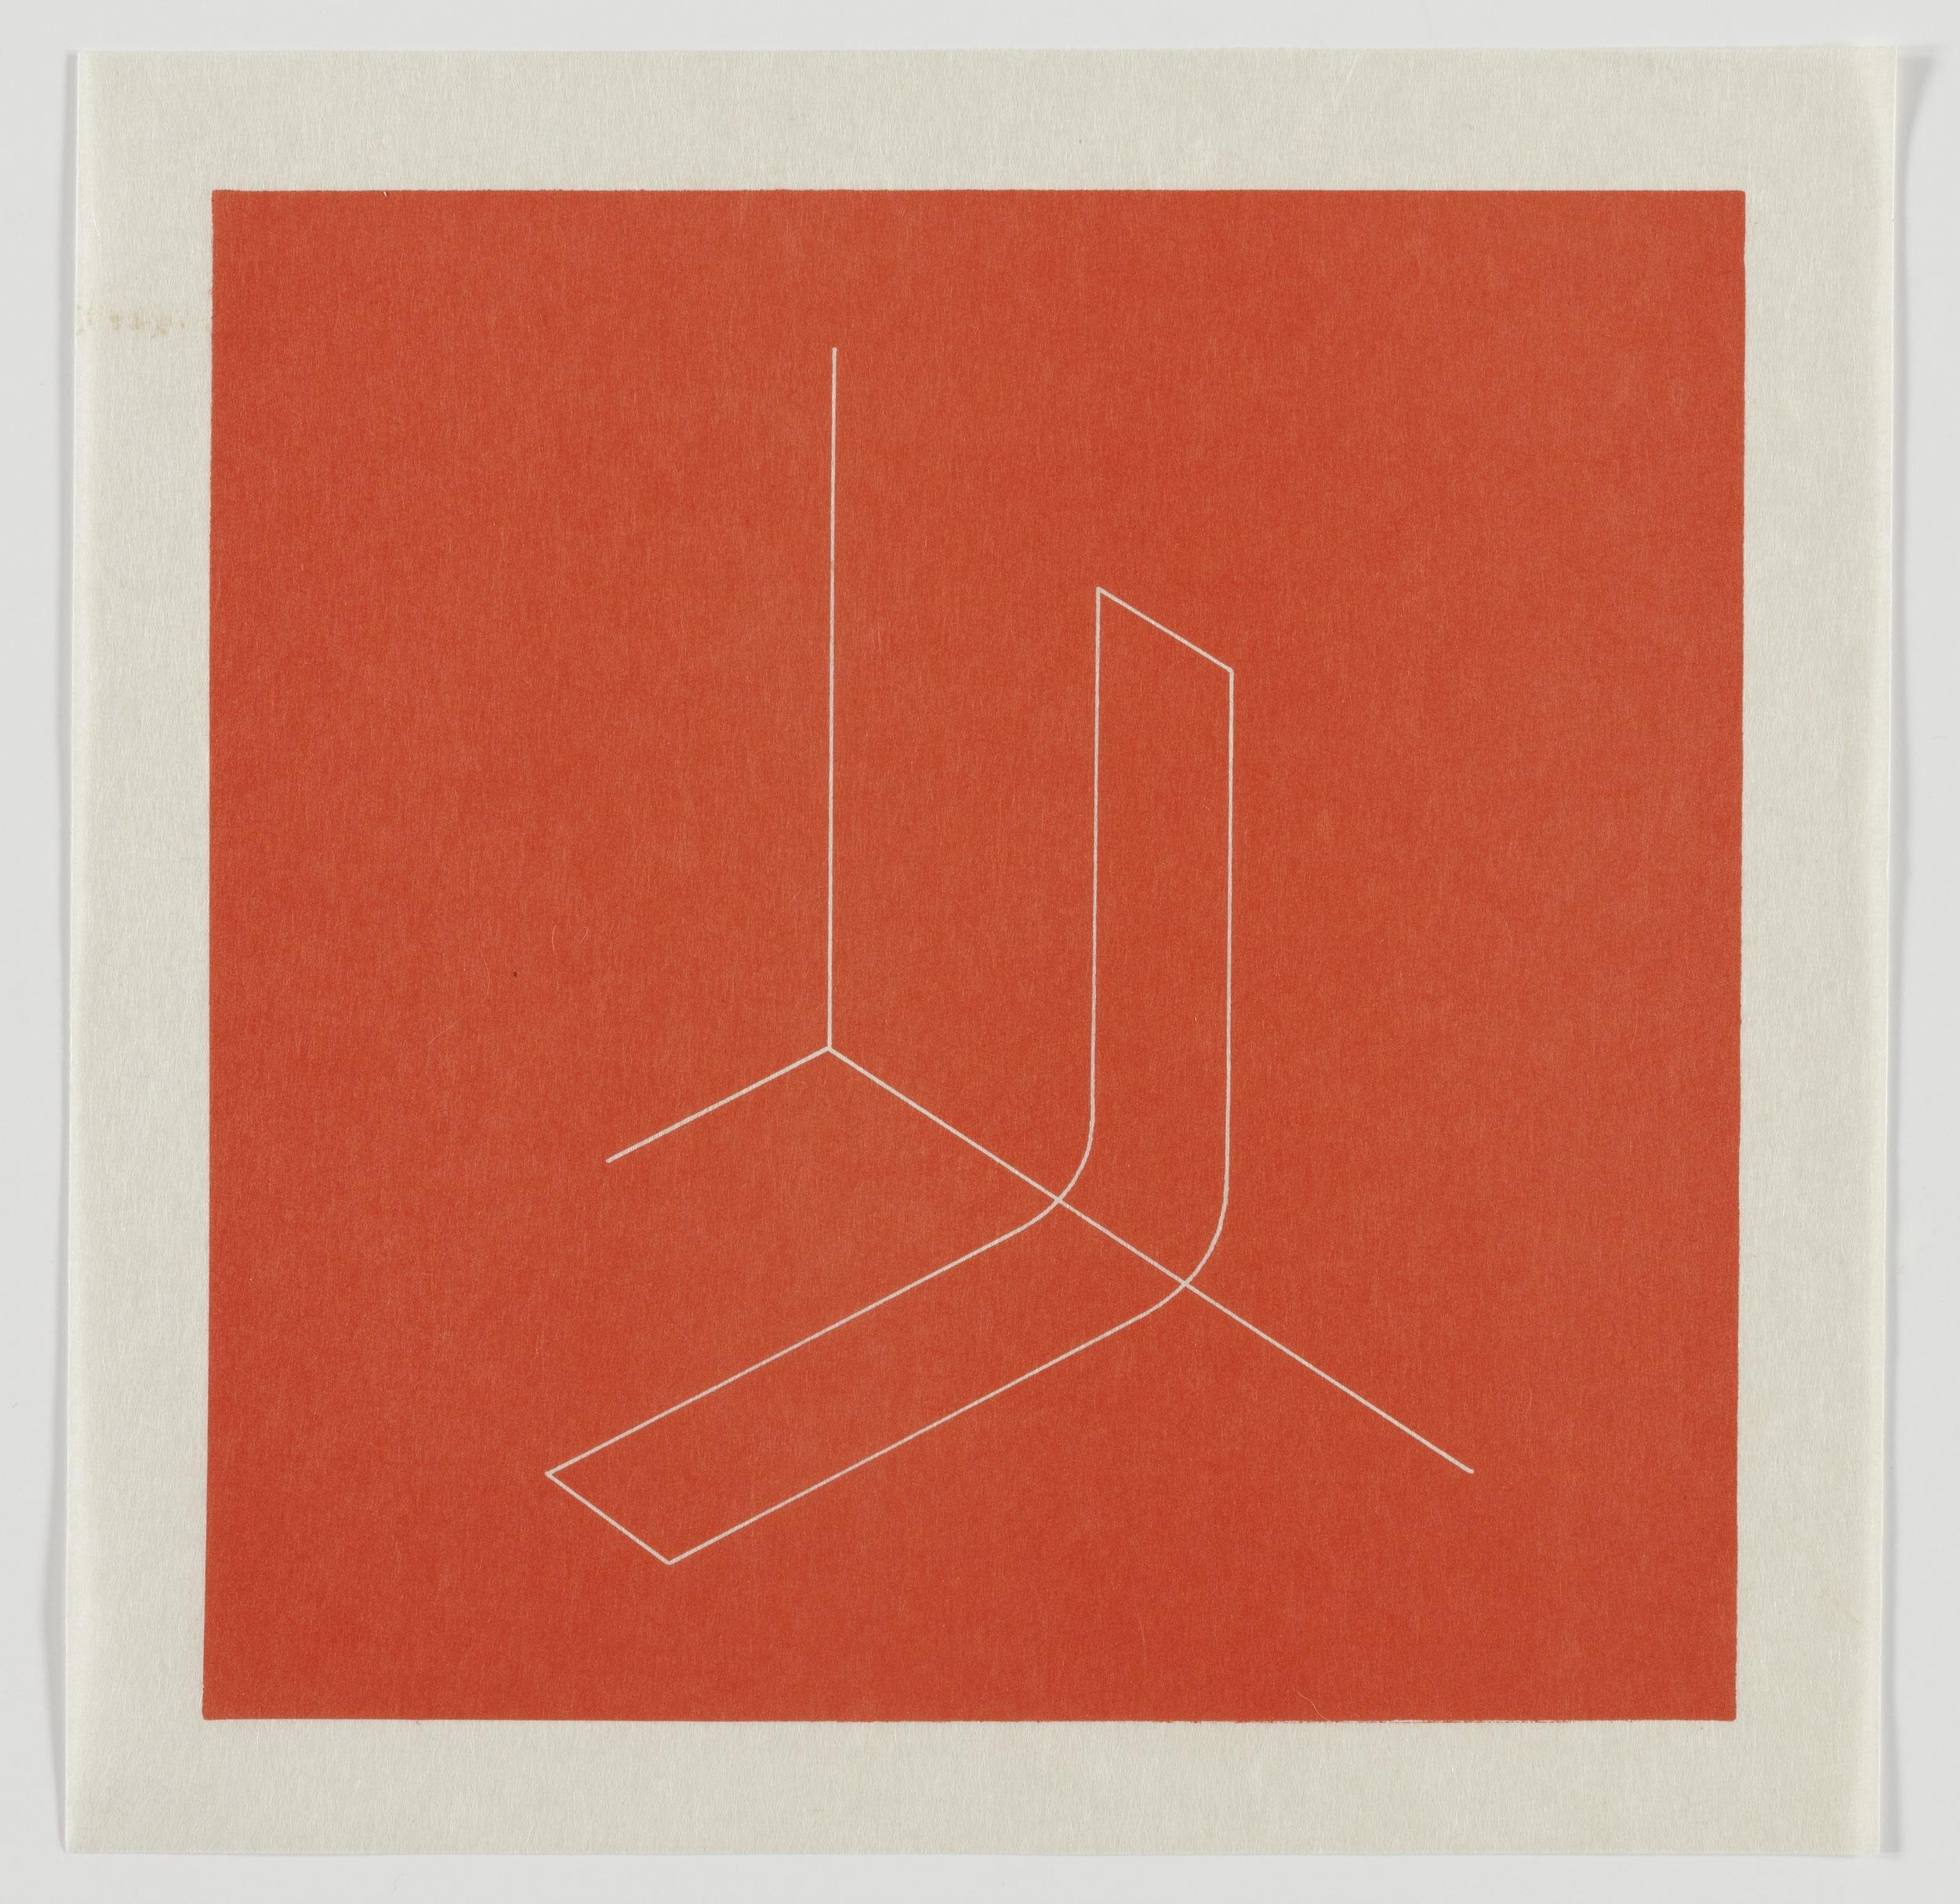 Fred Sandback, Untitled, 1979, Lithograph on Japanese paper, plate: 8 x 8, sheet: 9 1/2 x 9 1/2,FSA7905  Lawrence Markey Inc.  10/11